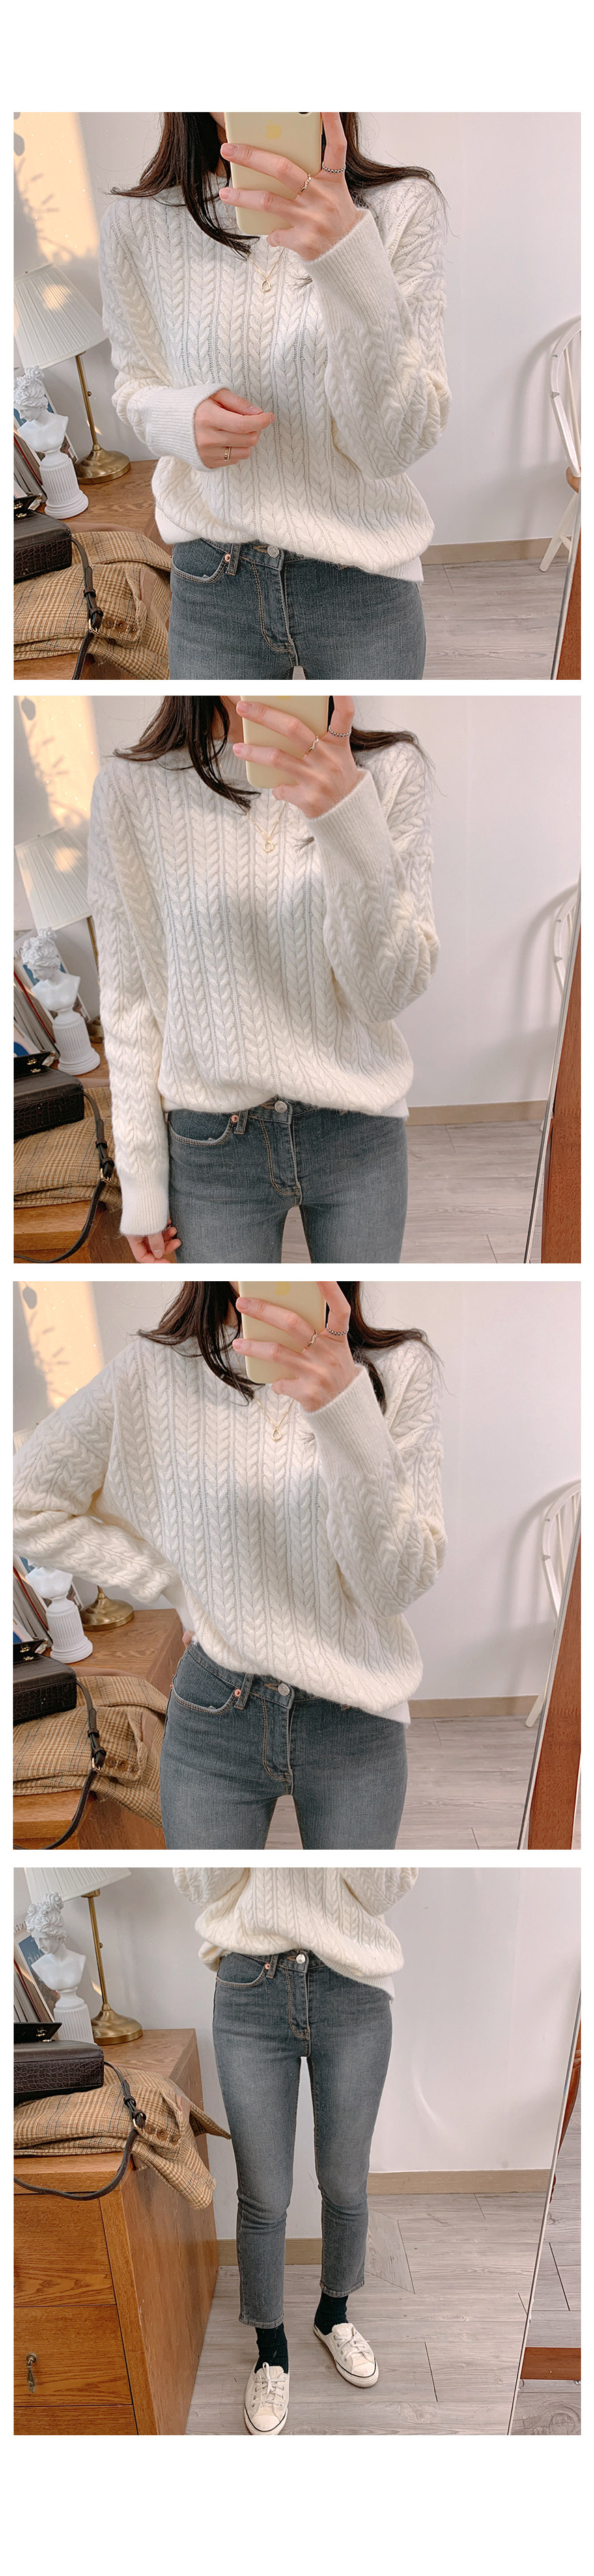 Vienna Wool Pretzel knit-2color